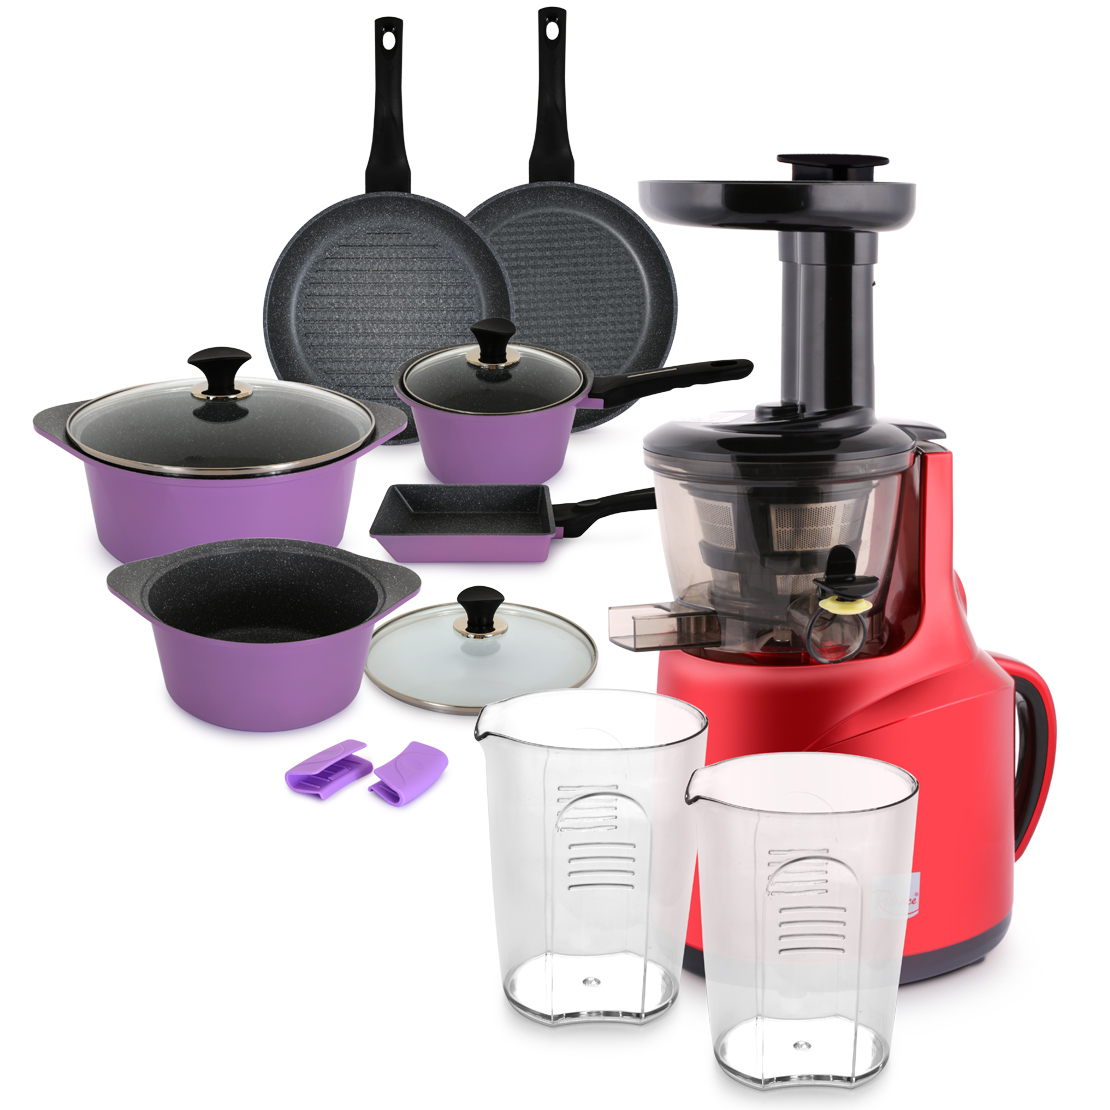 Slow Juicer Red & 10 Piece Cookware Set